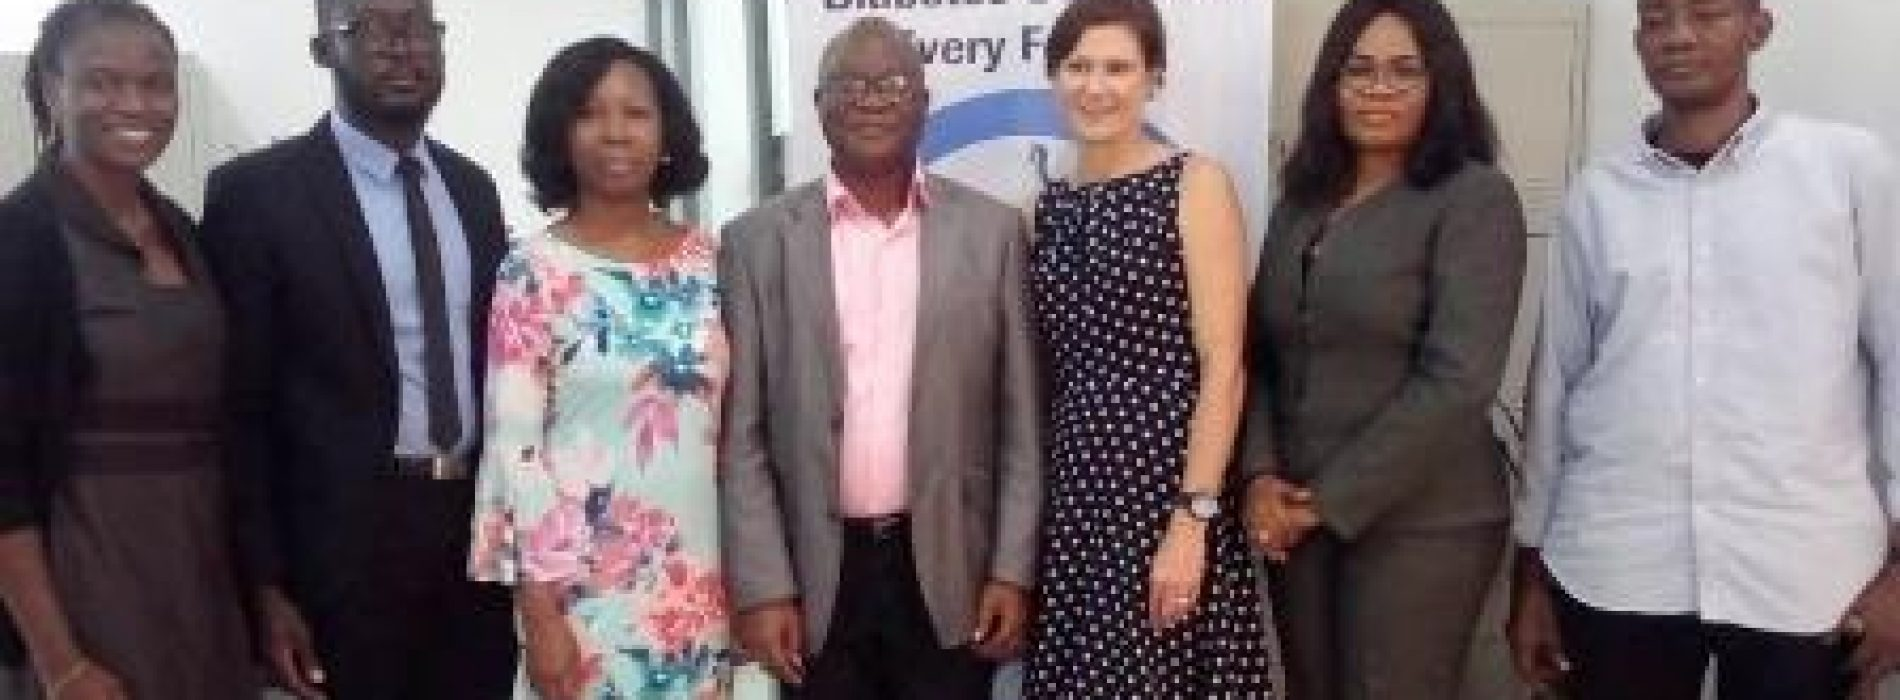 Why diabetes mgt. in Nigeria needs urgent Govt. intervention, stakeholders speak